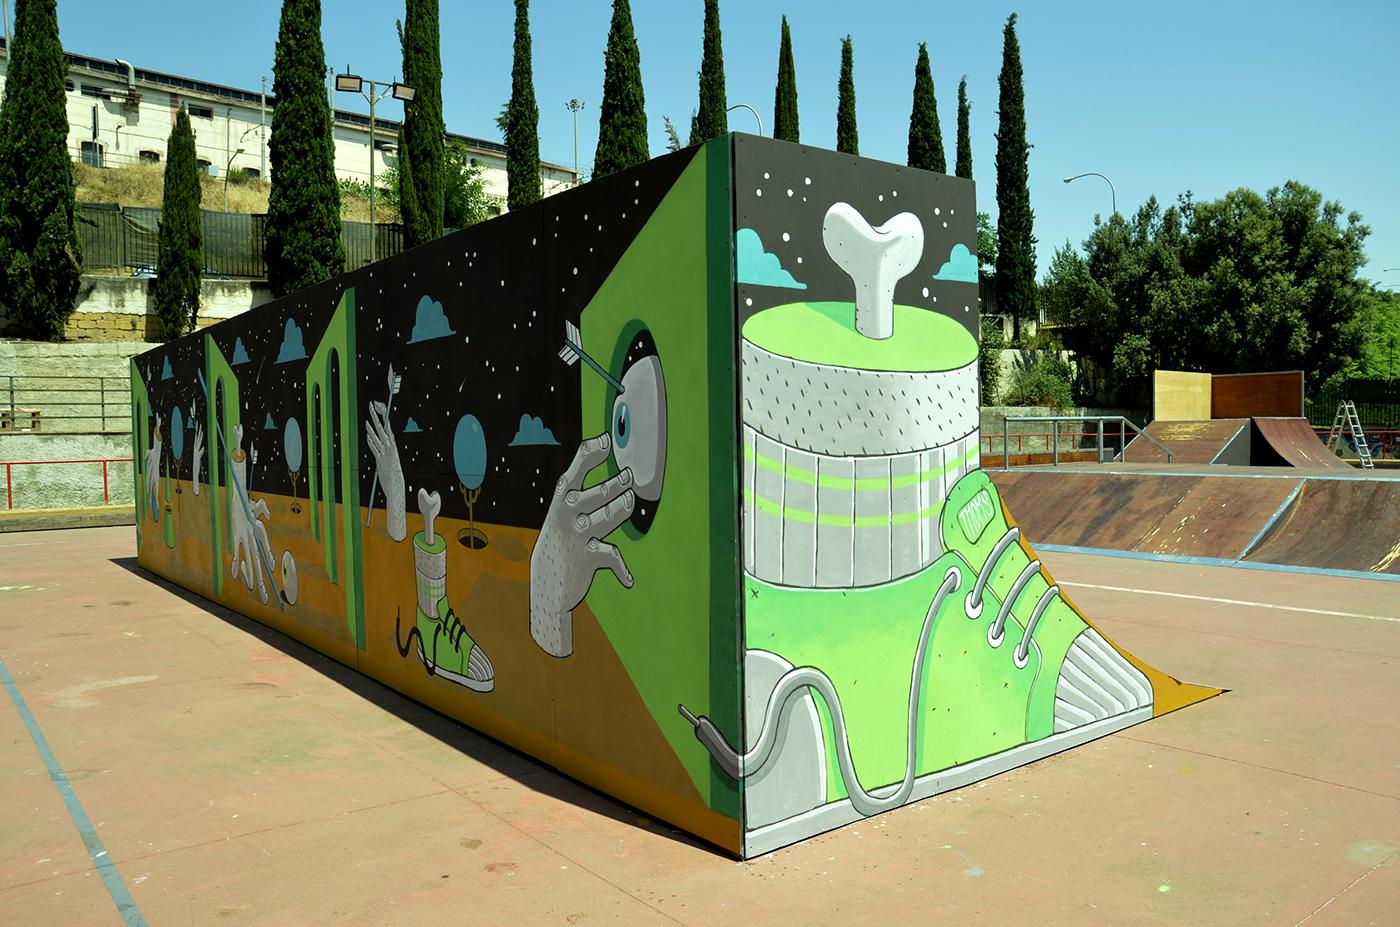 diego della posta mister thoms street art skatepark6 - Mister Thoms : skatepark arty et fresque 3D